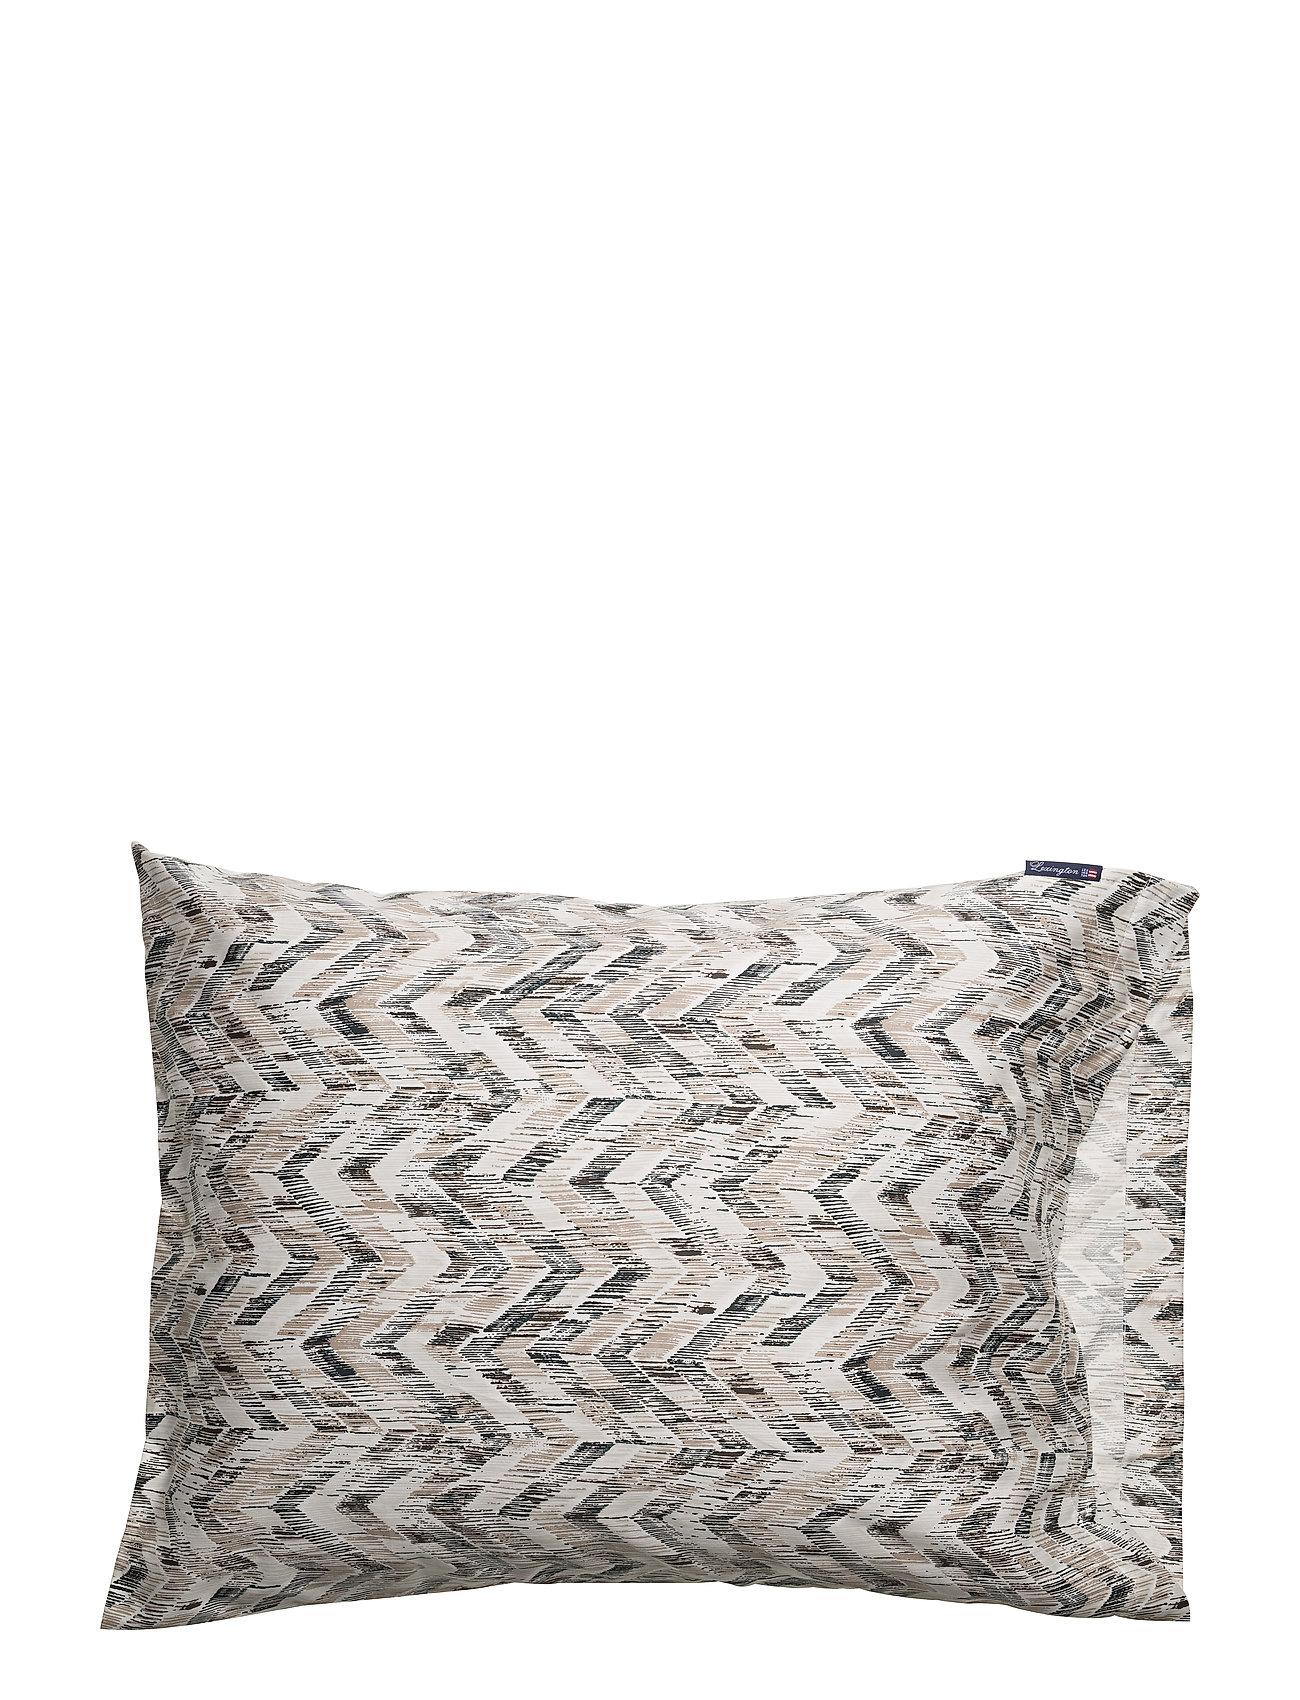 Lexington Home Printed Sateen Pillowcase